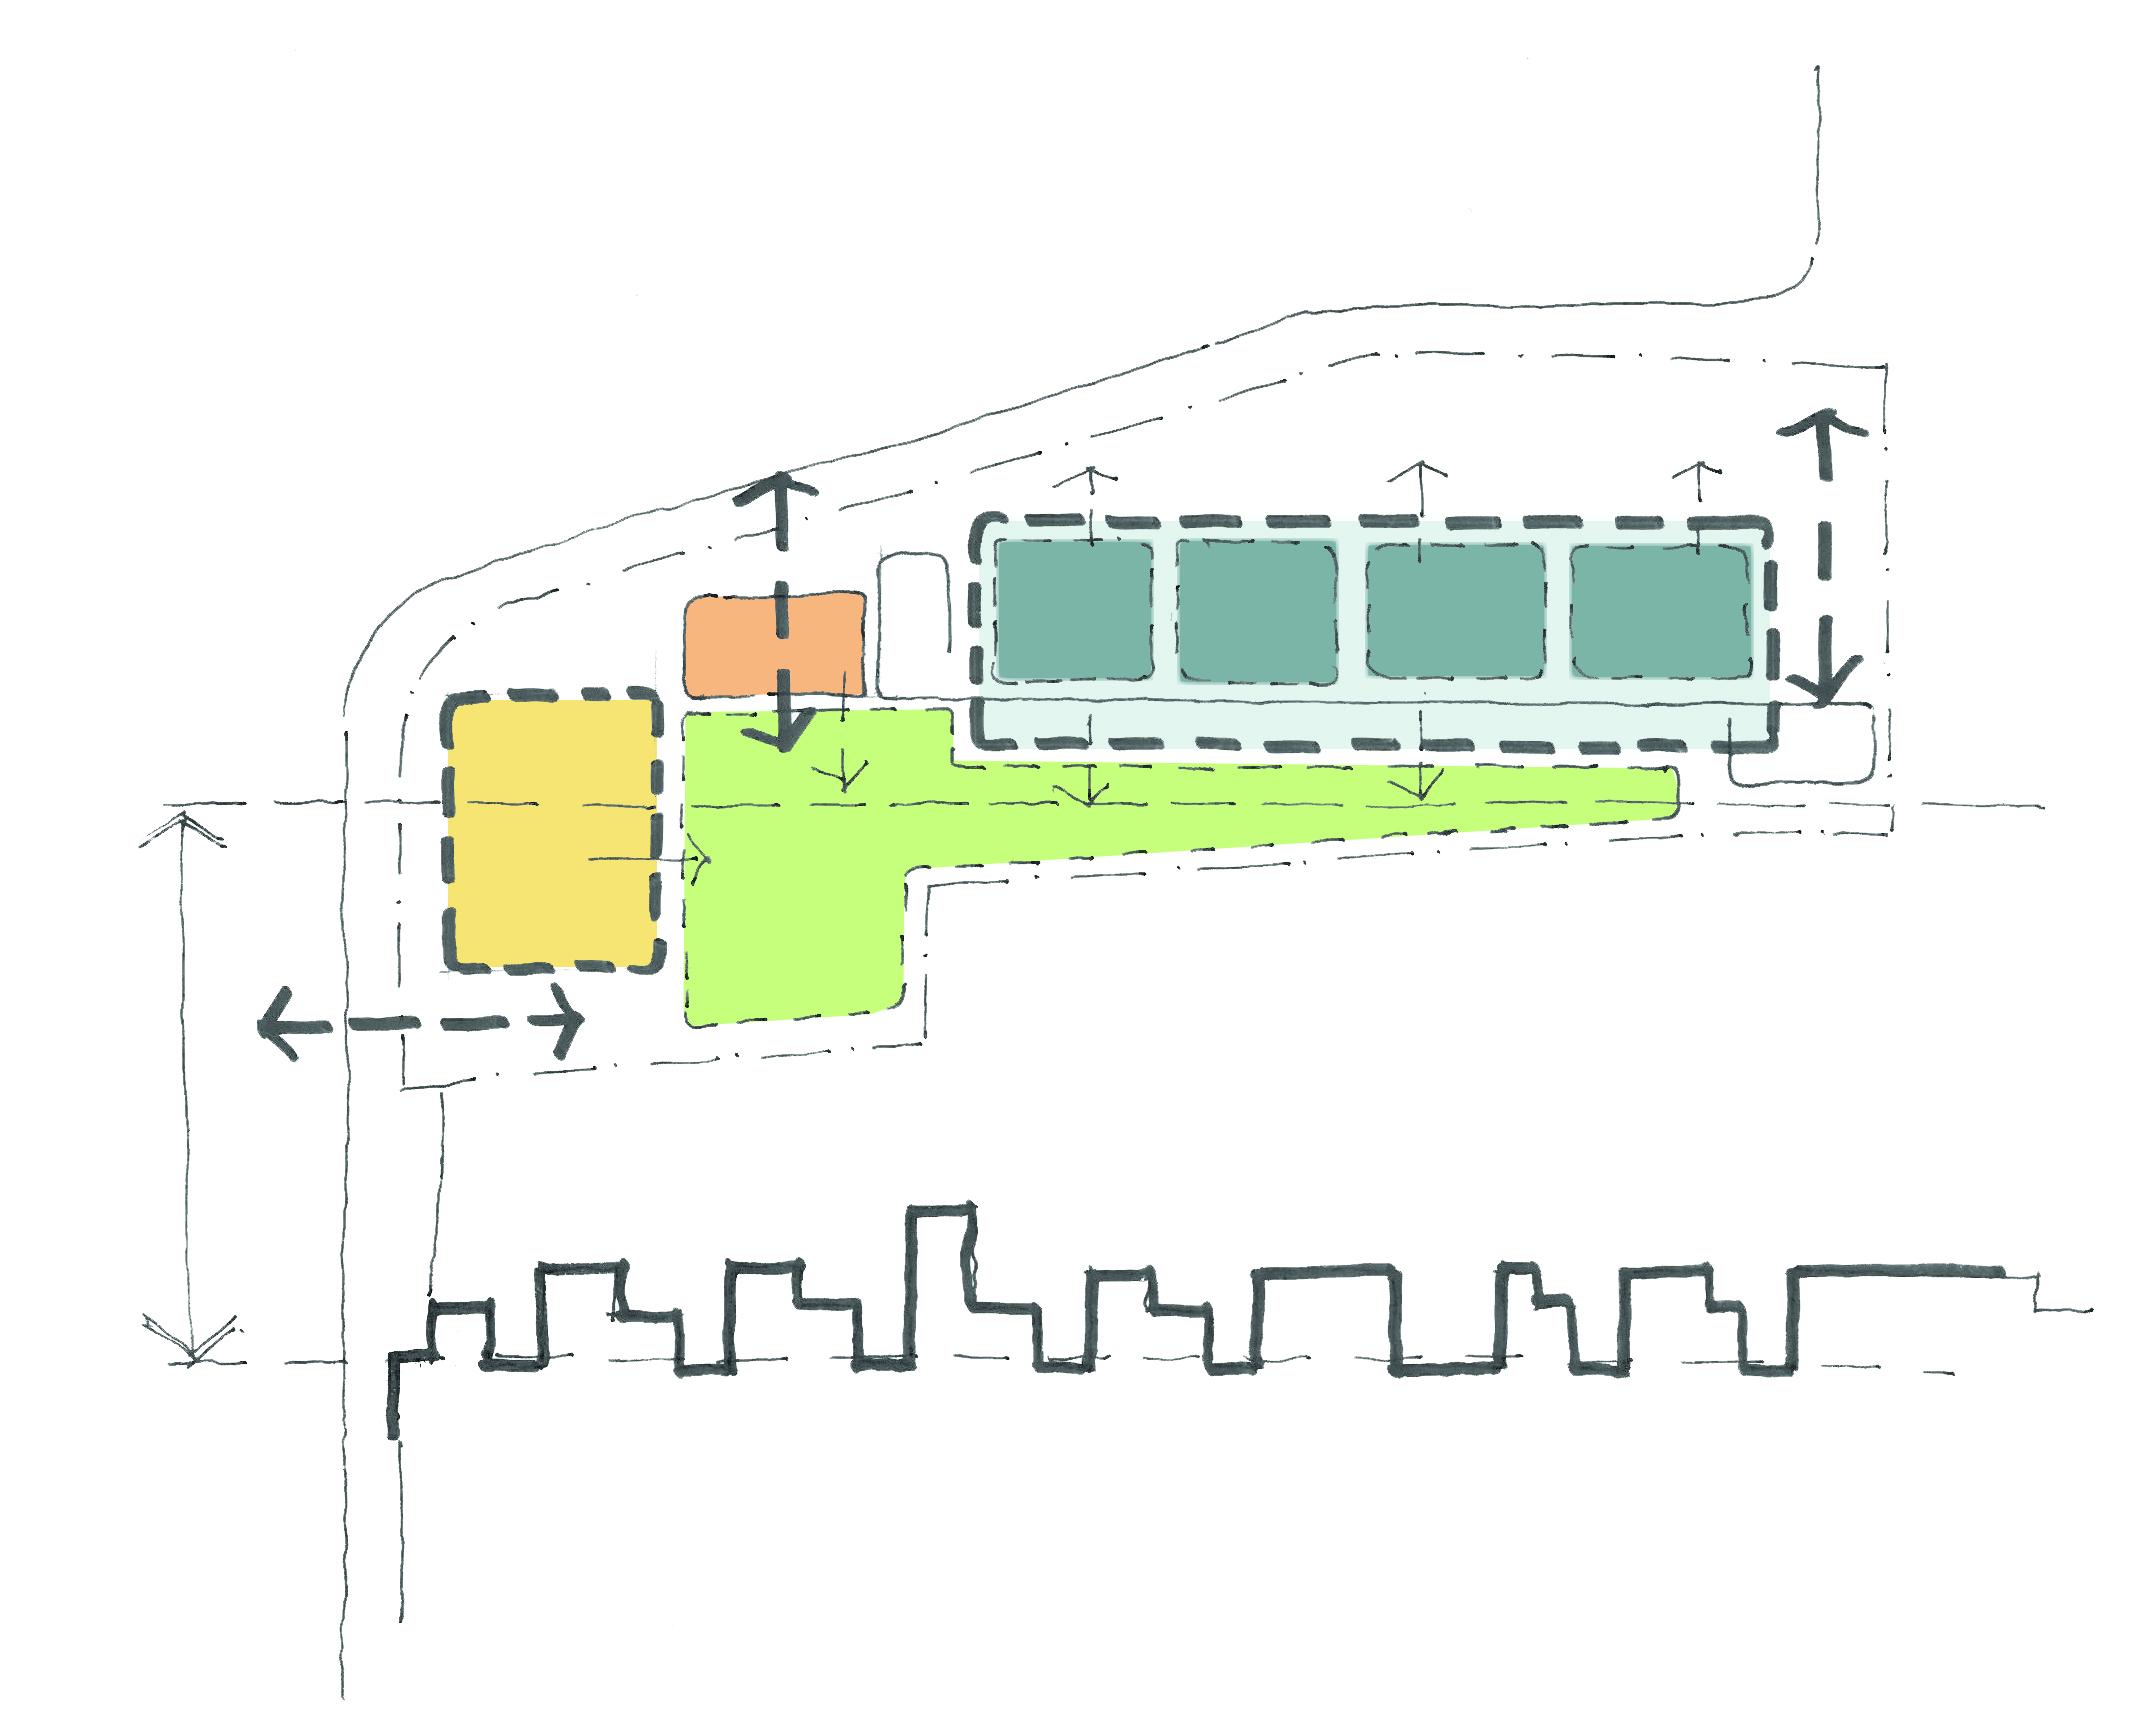 2264_Diagram01.jpg